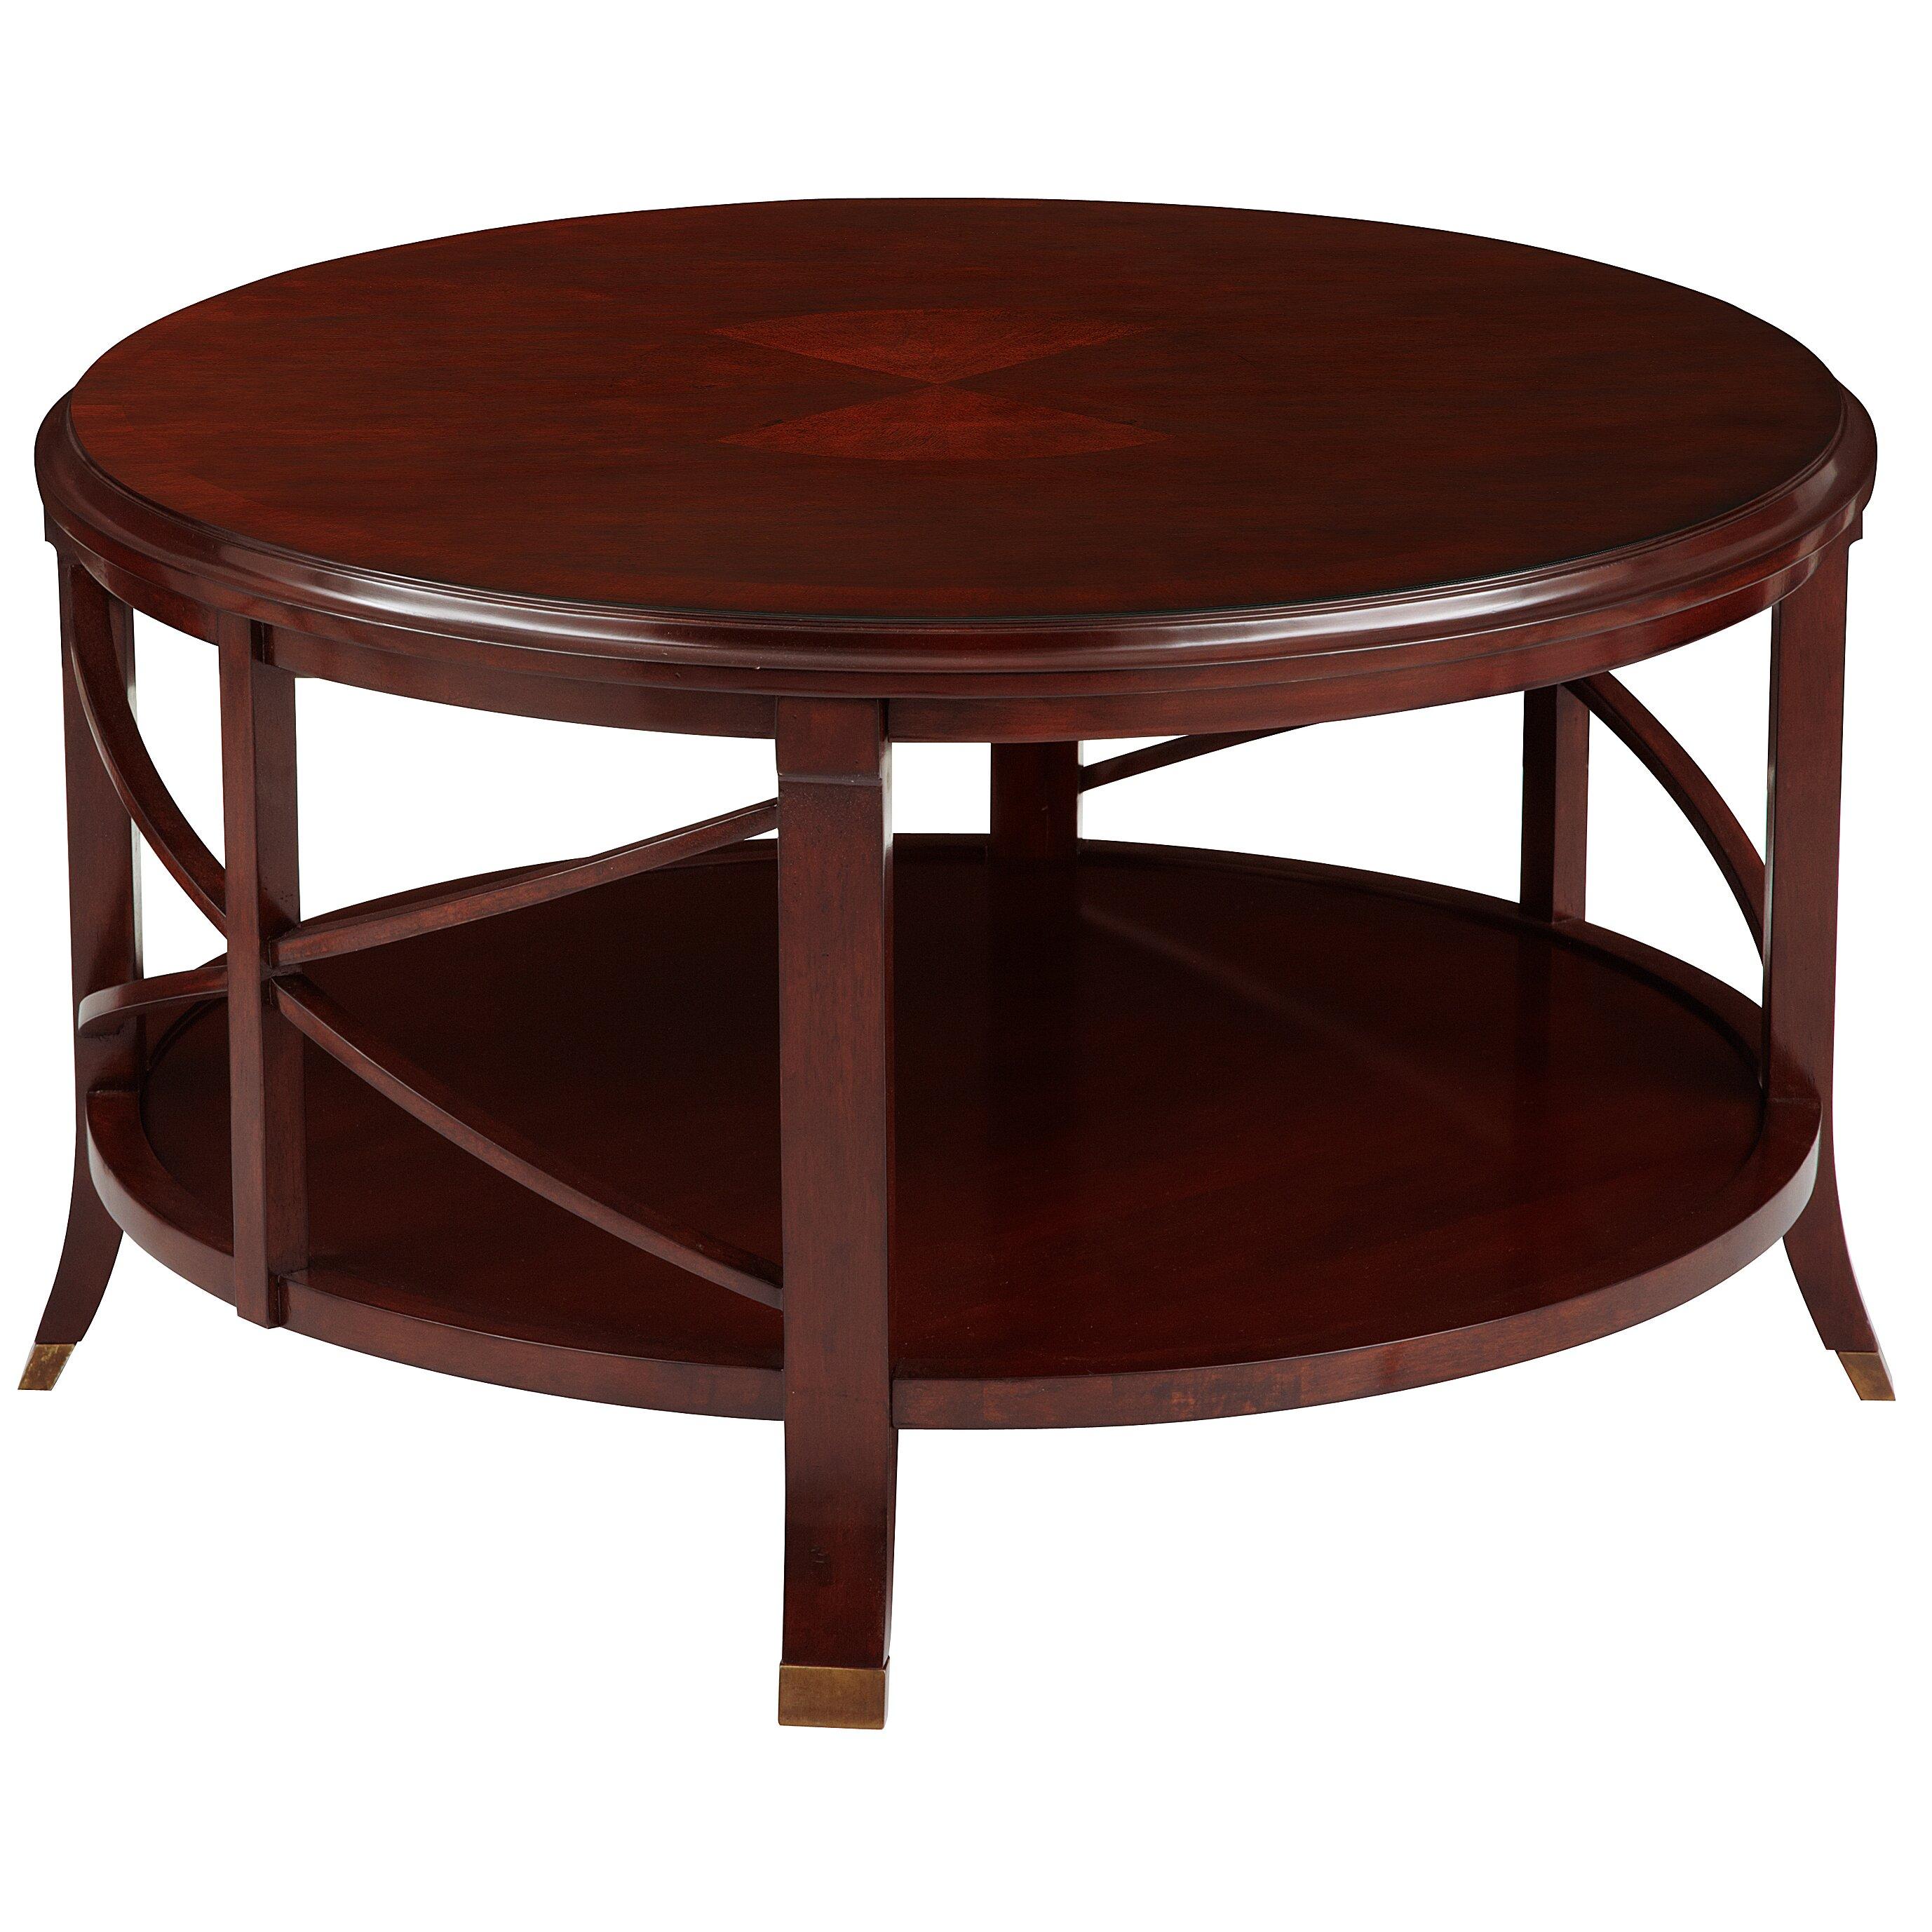 bombay pavilion coffee table reviews wayfair. Black Bedroom Furniture Sets. Home Design Ideas